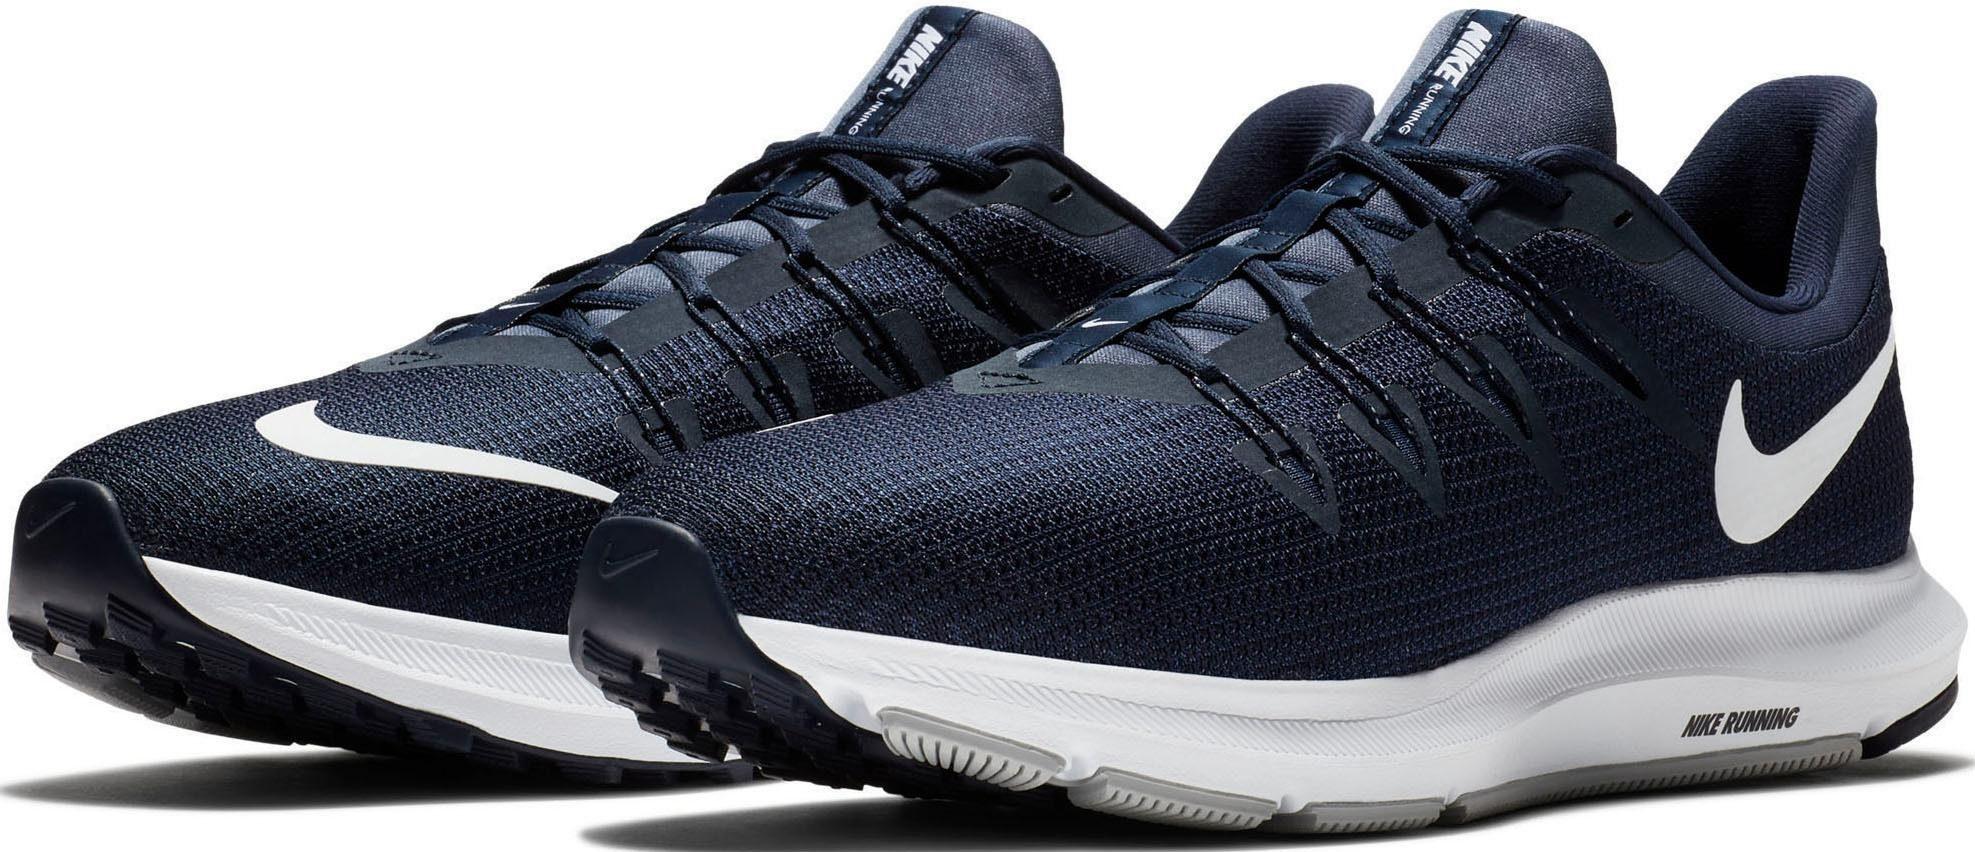 Nike »Quest« Laufschuh, Atmungsaktives Obermaterial aus Mesh online kaufen  | OTTO